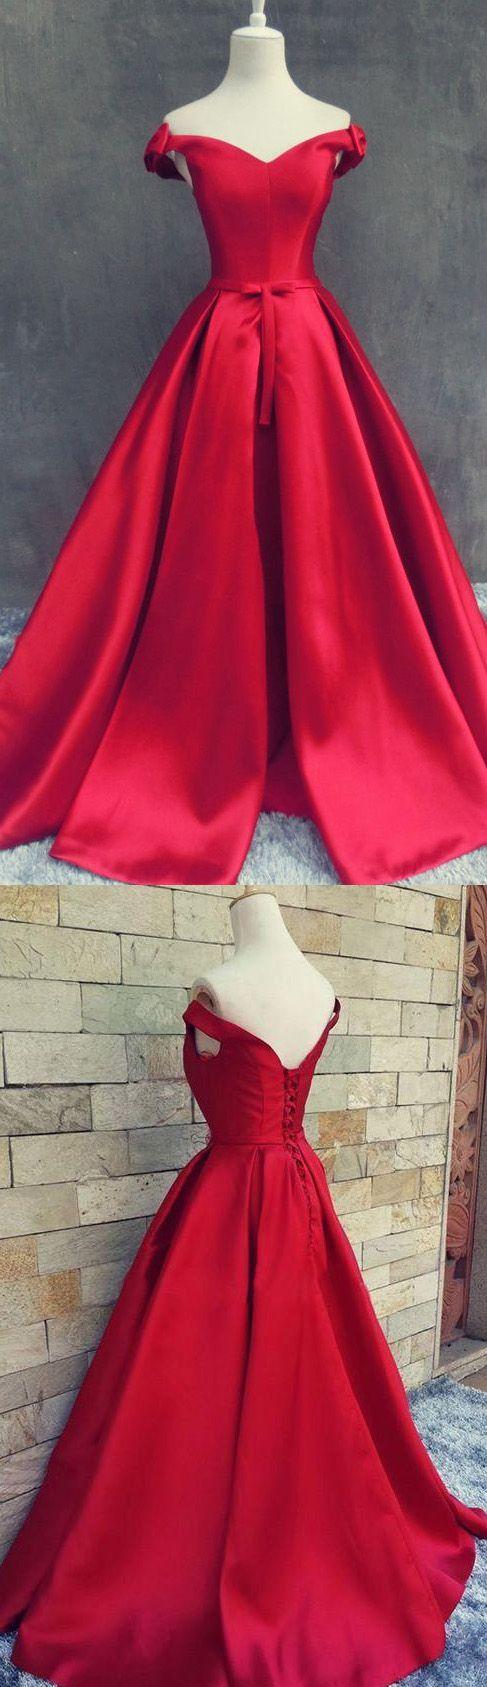 Red prom dresses short prom dresses long sleeve prom dresses long